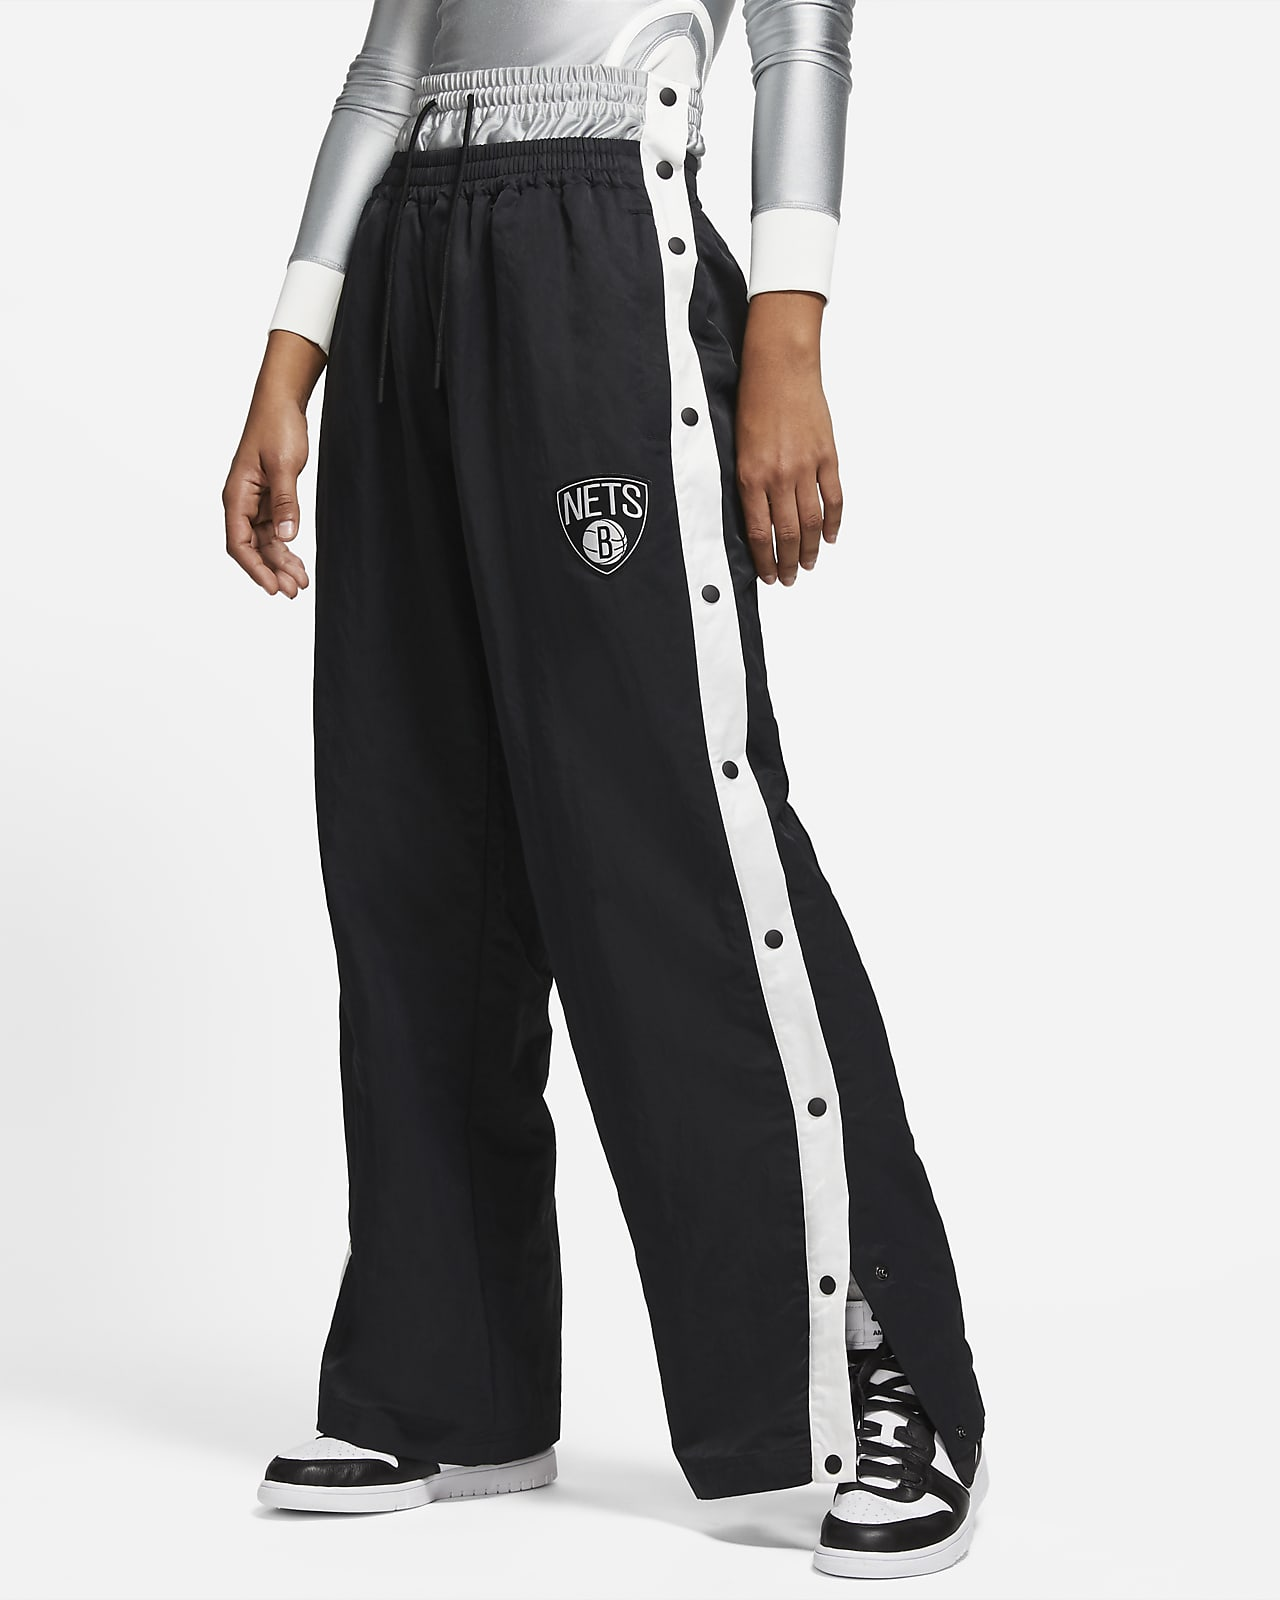 Nike x AMBUSH Women's Tearaway Trousers